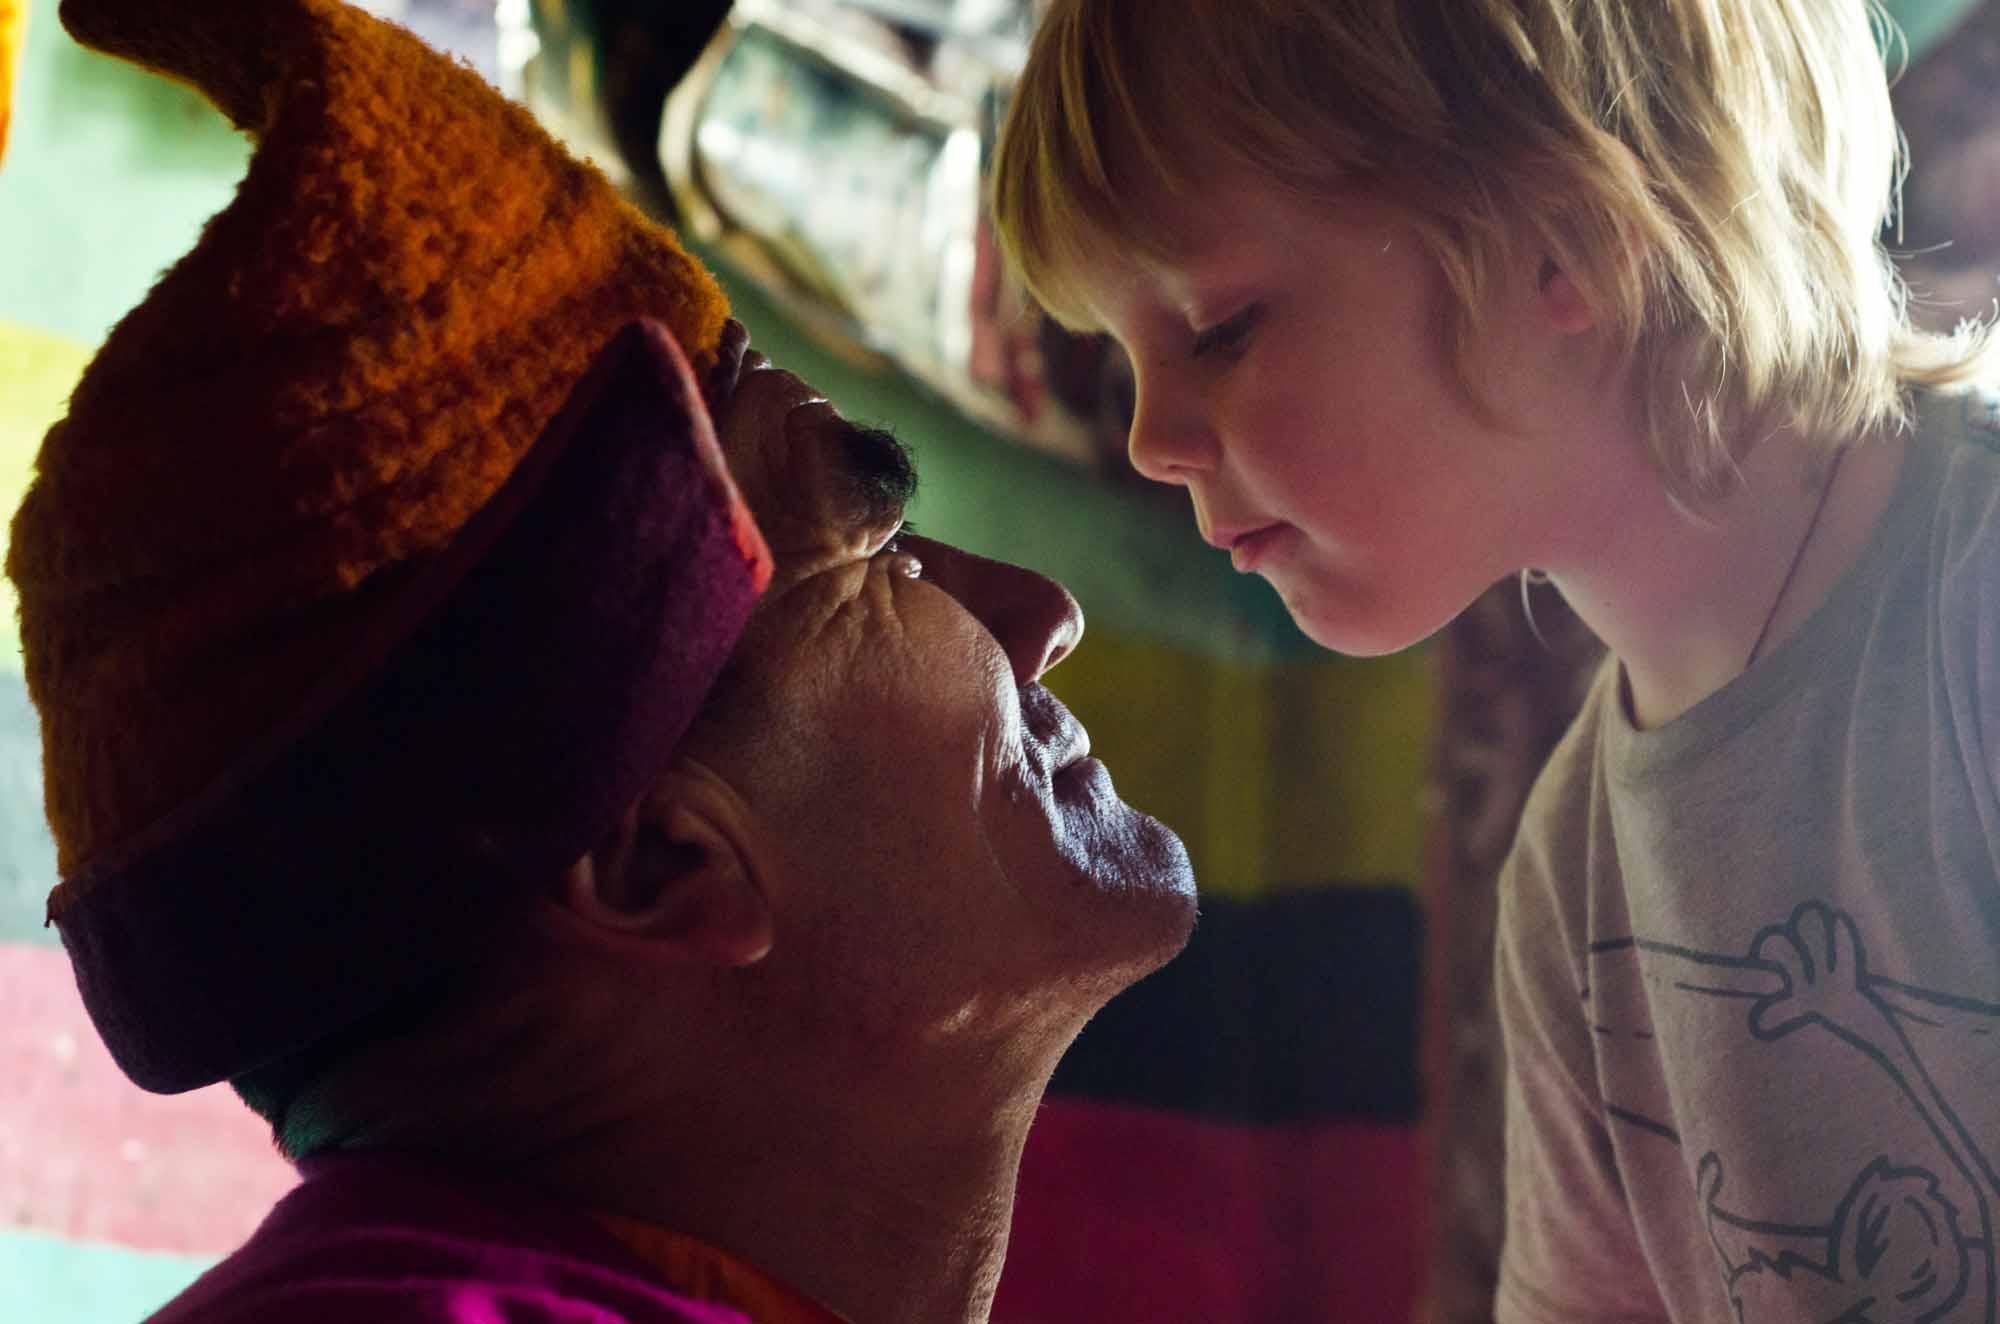 Blue-Sky-Kingdom-Family-Vacation-to-a-Buddhist-Monastery-KarshaGompa-BruceKirkby-child-and-teacher